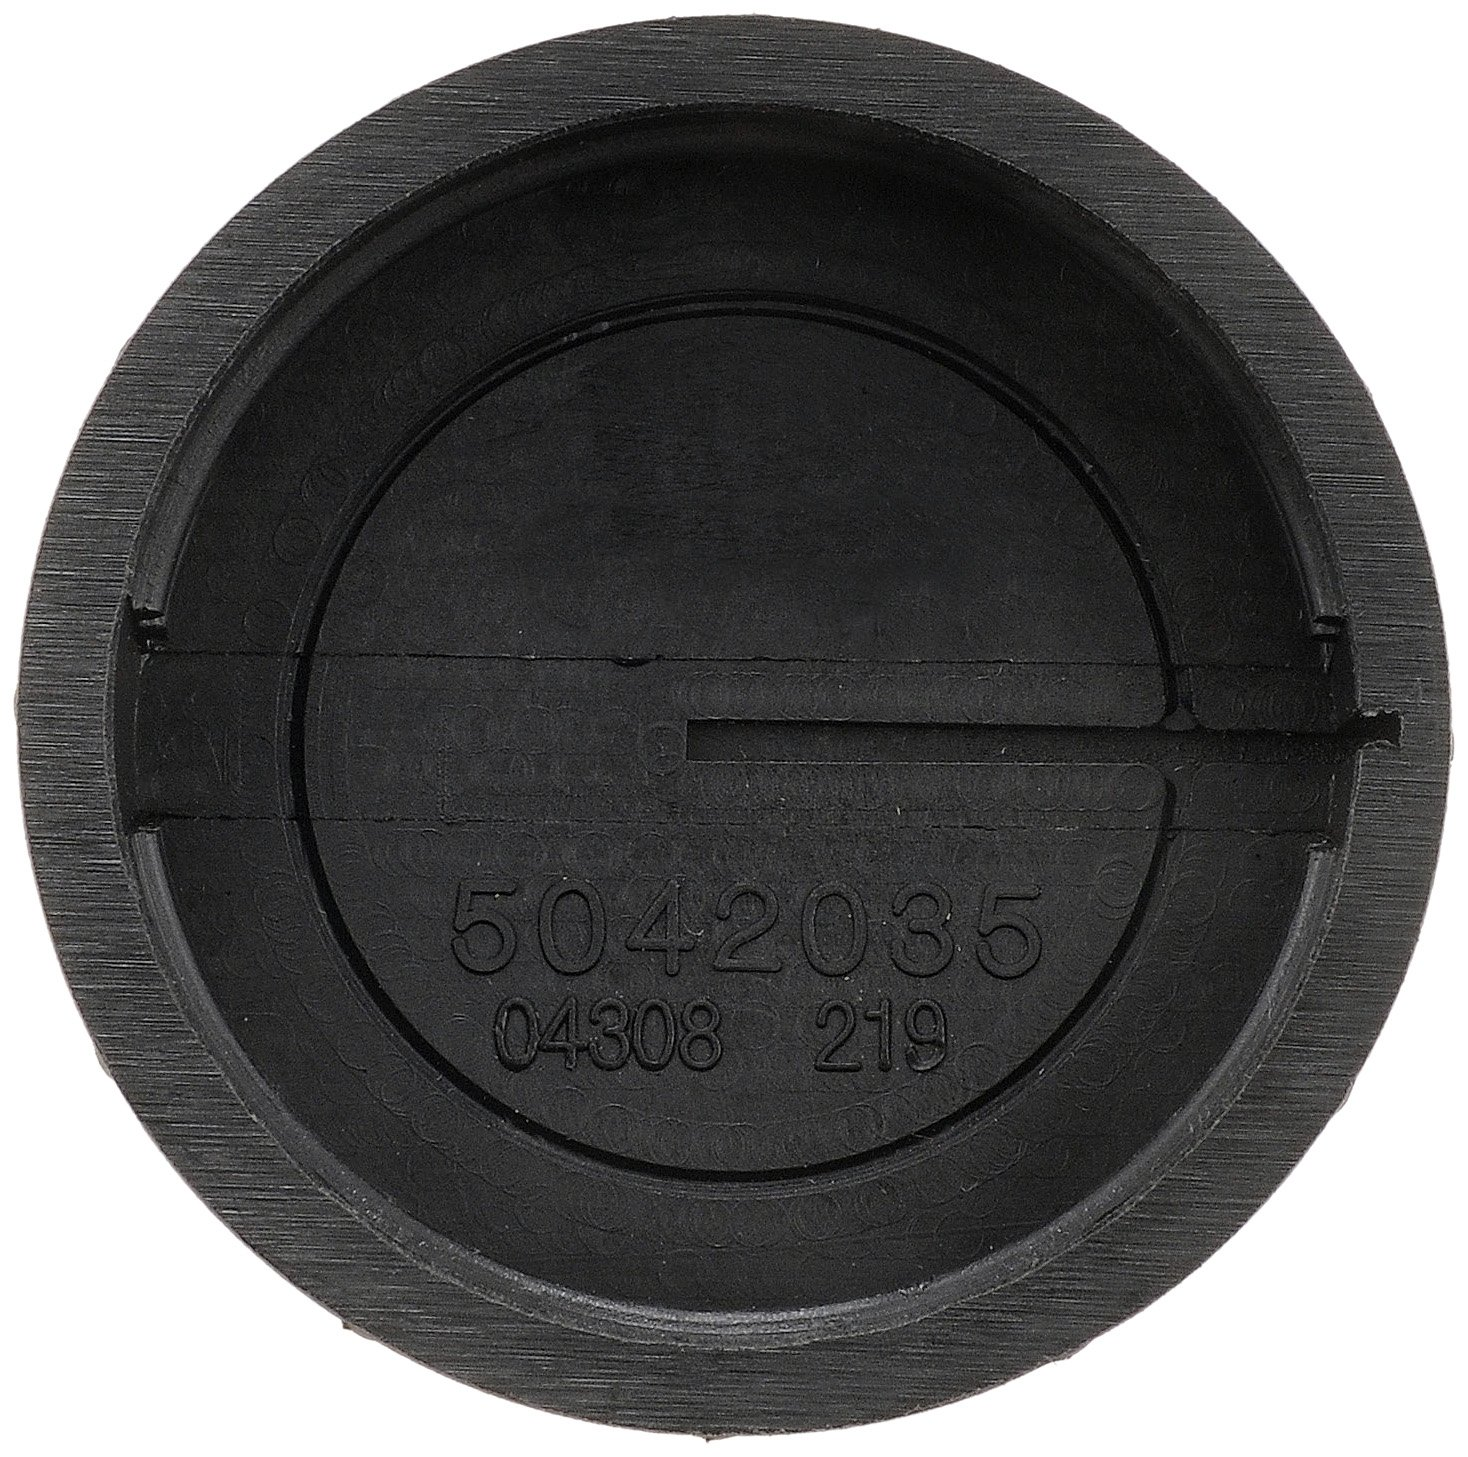 Dorman HELP 42035 Master Cylinder Cap